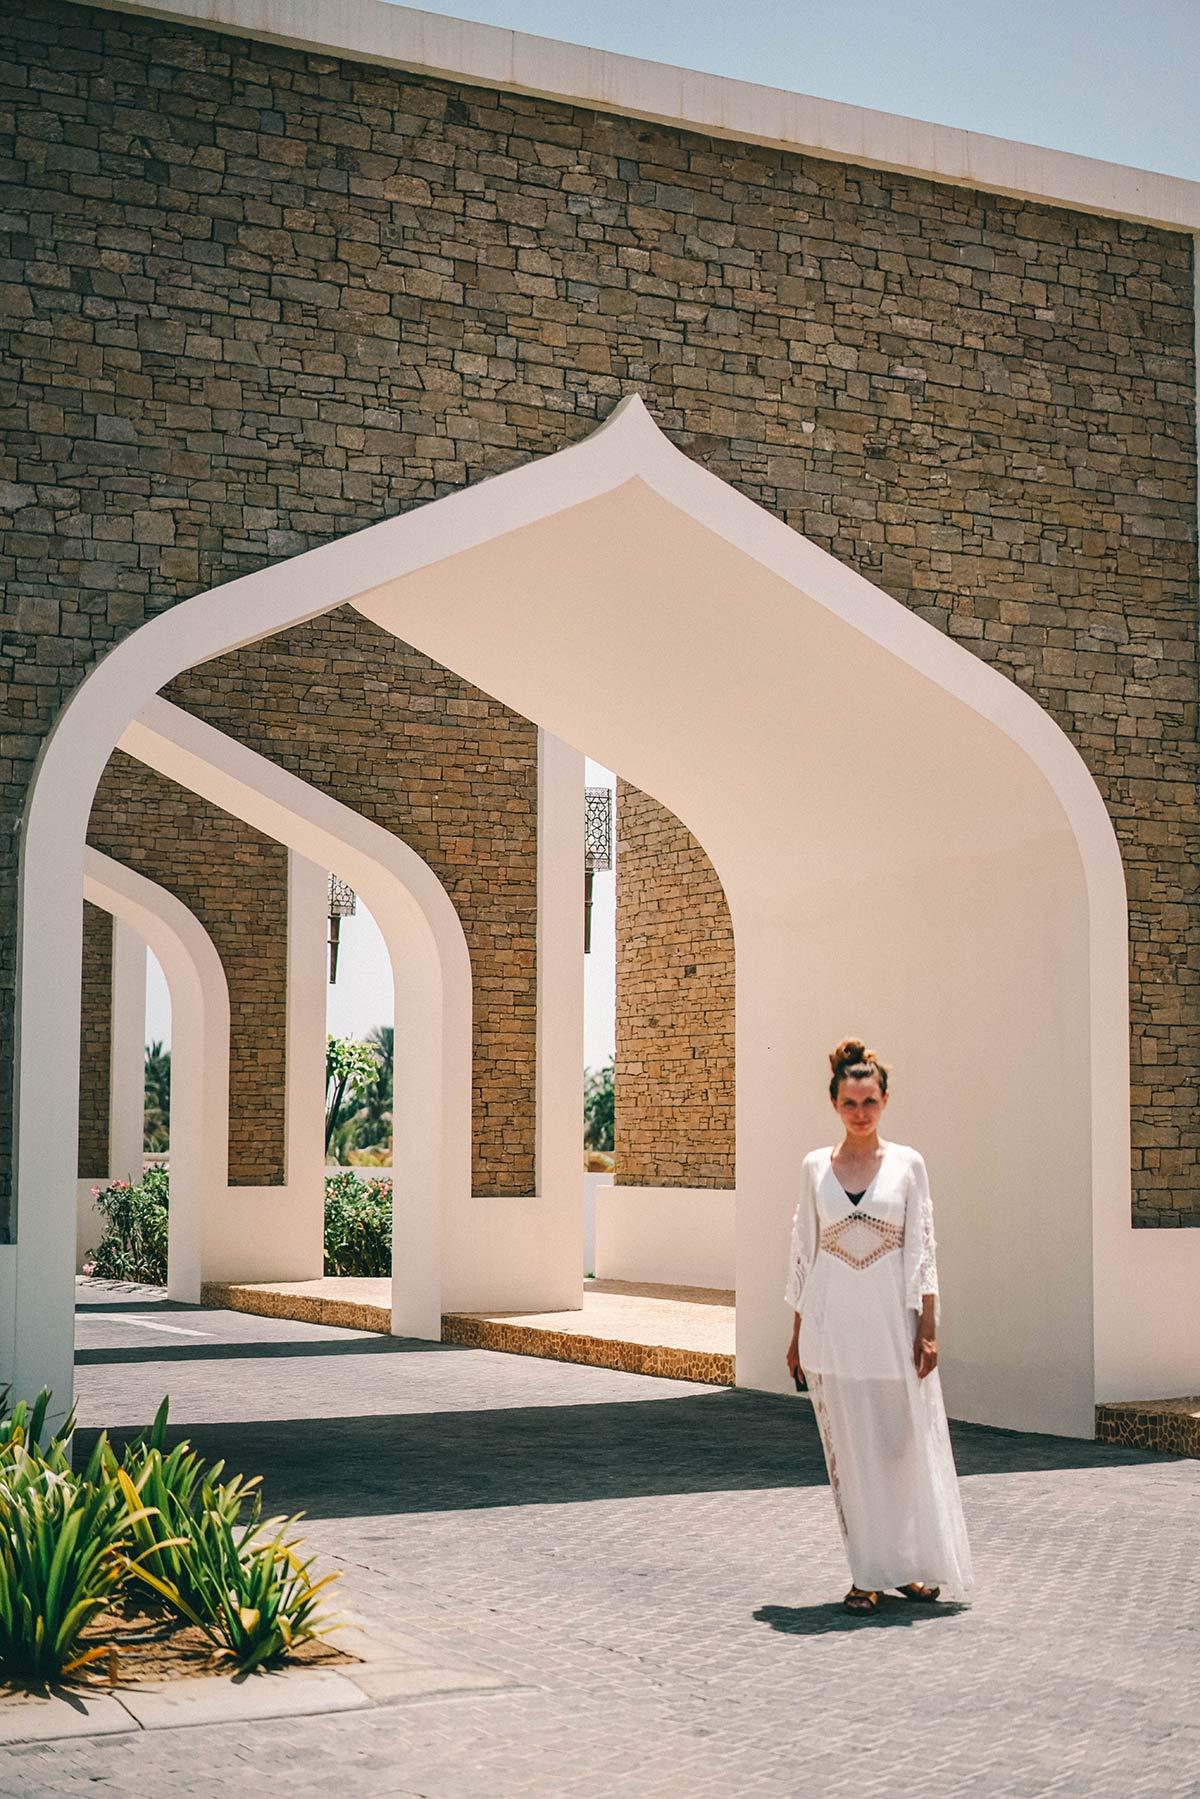 Oman Hotel Al Baleed Resort Salalah by Anantara